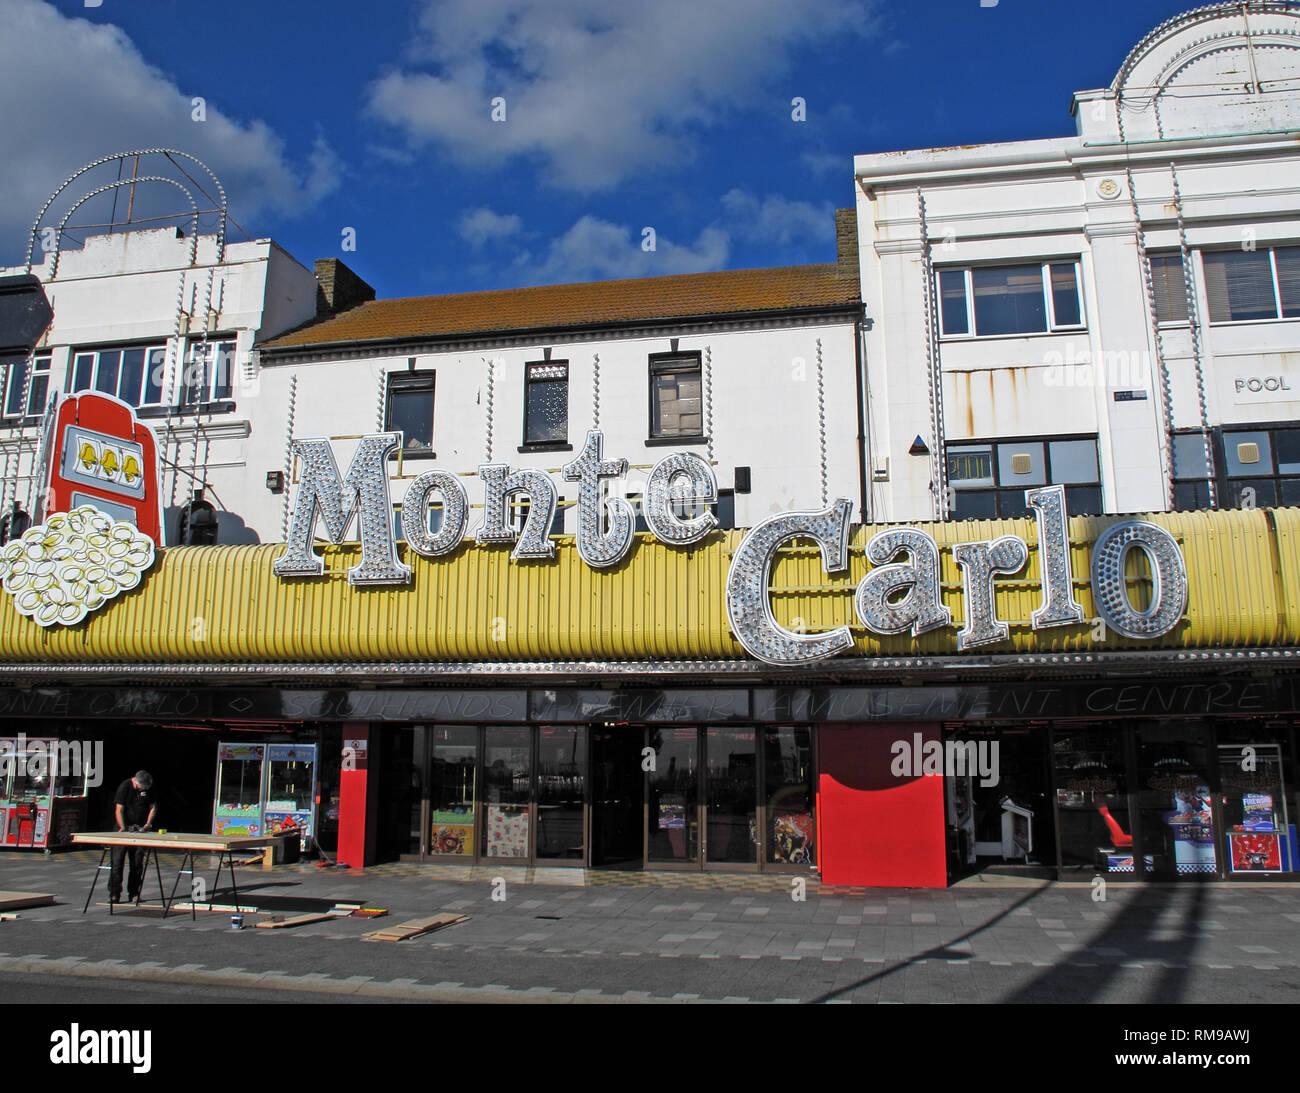 GoTonySmith,HotpixUK,@HotpixUK,England,UK,GB,Southend,Seaside,town,Essex,South East England,classic,Southend-on-Sea,Southend on Sea,southeastern,English,english seaside,resort,Last Resort,seaside resort,Southend-on-Sea Borough Council,Borough,Council,Shakedown,Great London Rideout,seafront,SS1,SS1 2EJ,Monte Carlo,Amusement Arcade